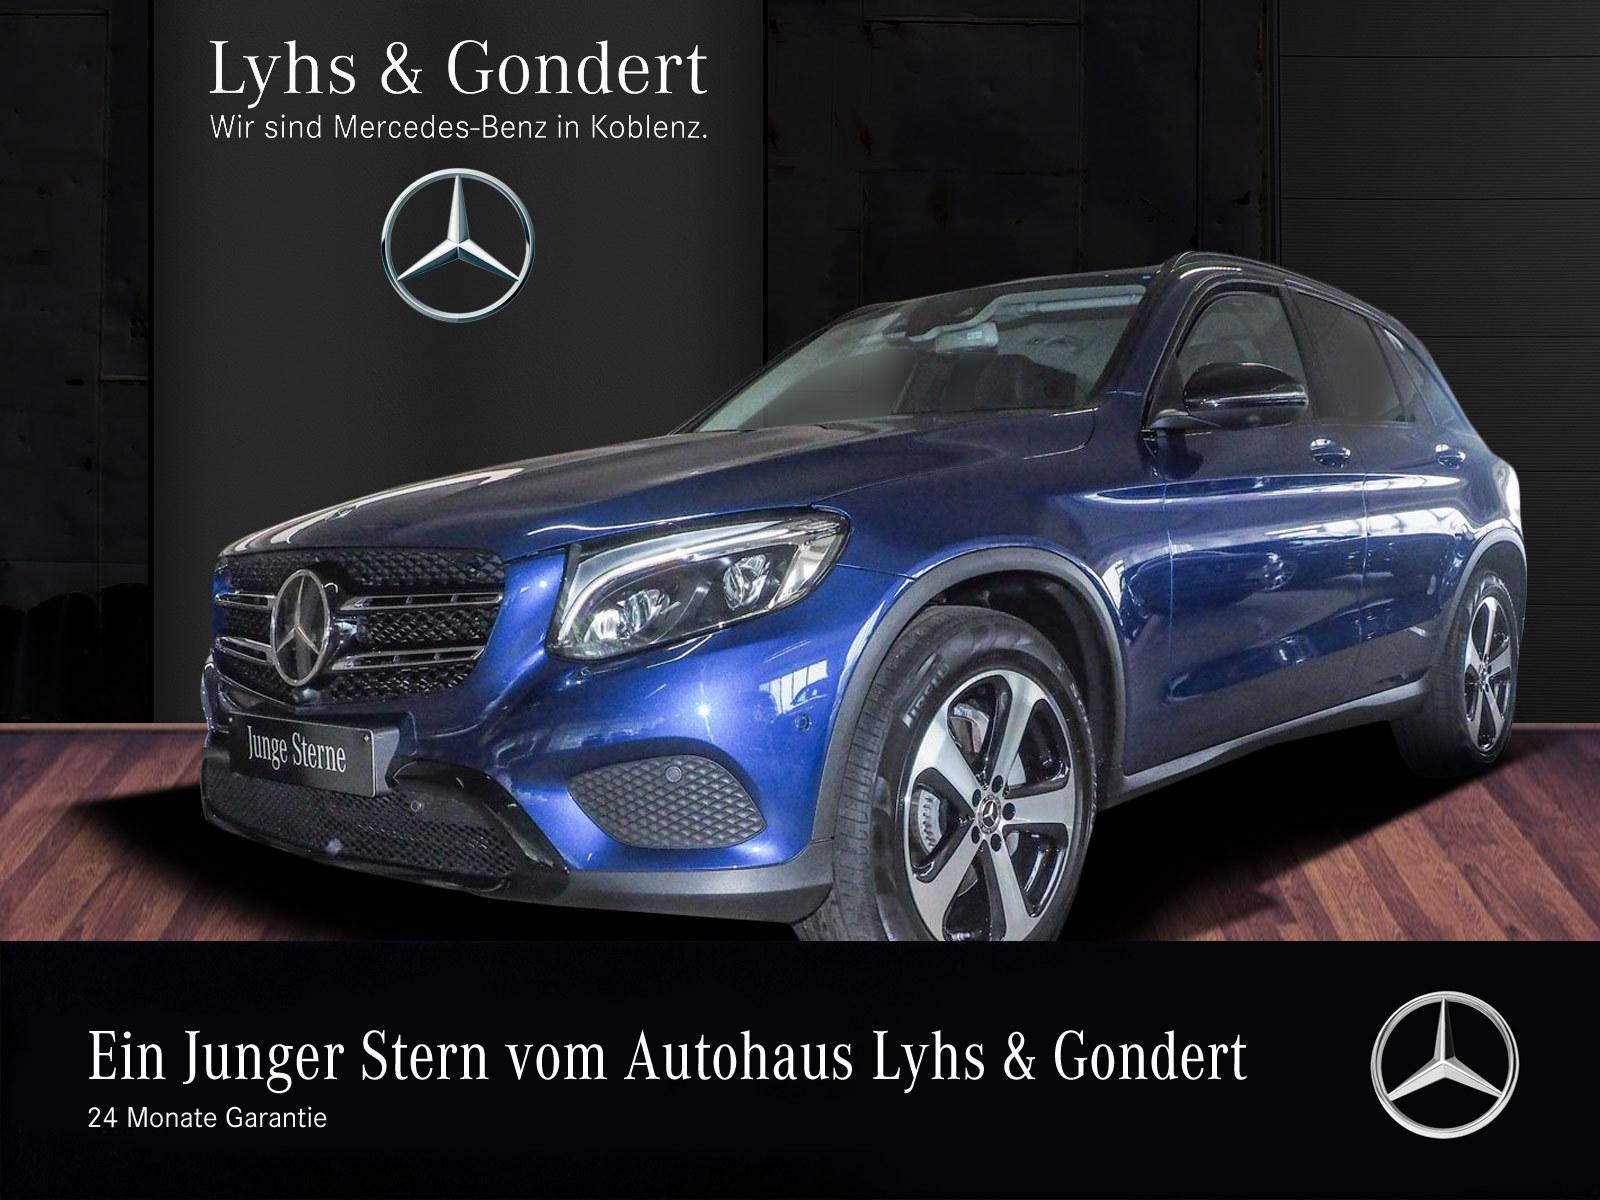 Mercedes-Benz GLC 350 d 4MATIC Exclusive Comand Distronic 360°, Jahr 2018, Diesel